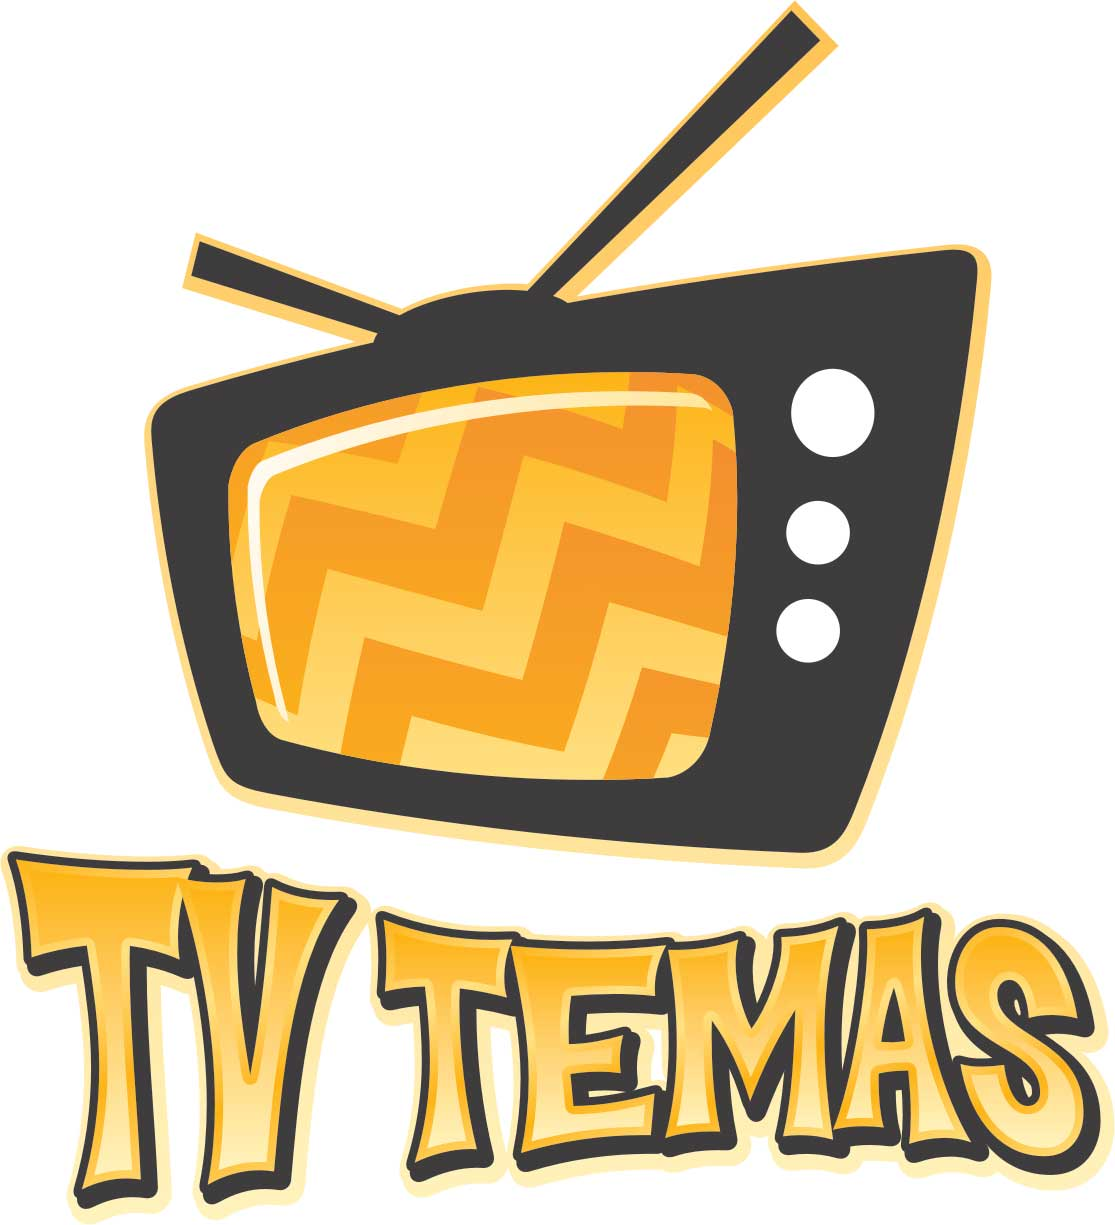 Magnificent logo-tv-temas-1--23e896. 1115 x 1225 · 77 kB · jpeg